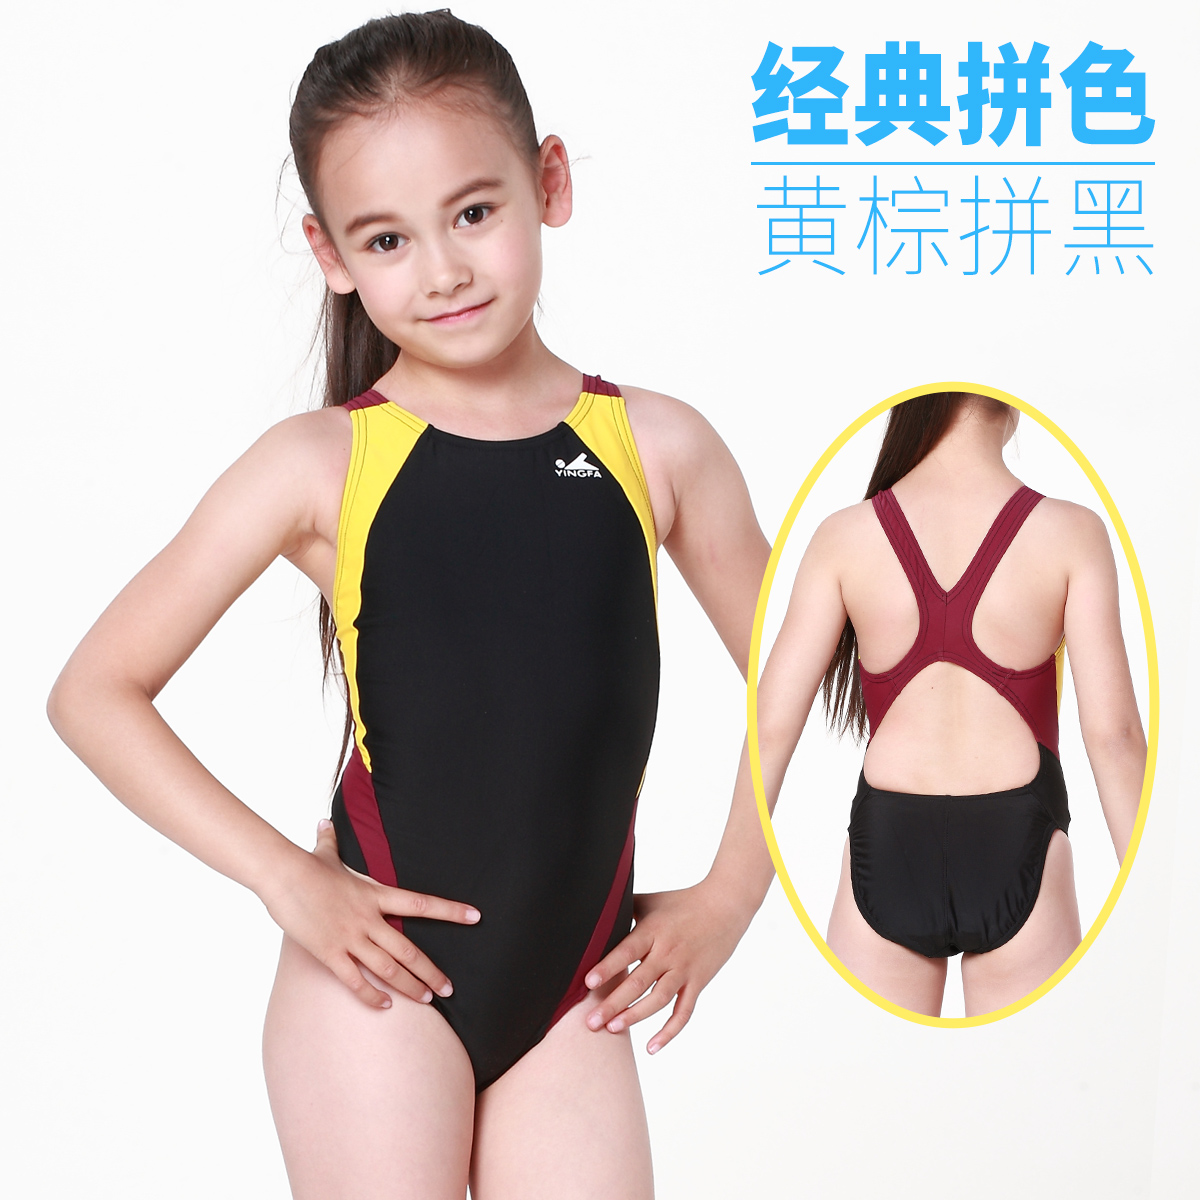 YINGFA Pakaian Renang Anak Satu Potong Segitiga Warna Campuran Profesional (Kuning coklat hitam untuk melawan) (Kuning coklat hitam untuk melawan)